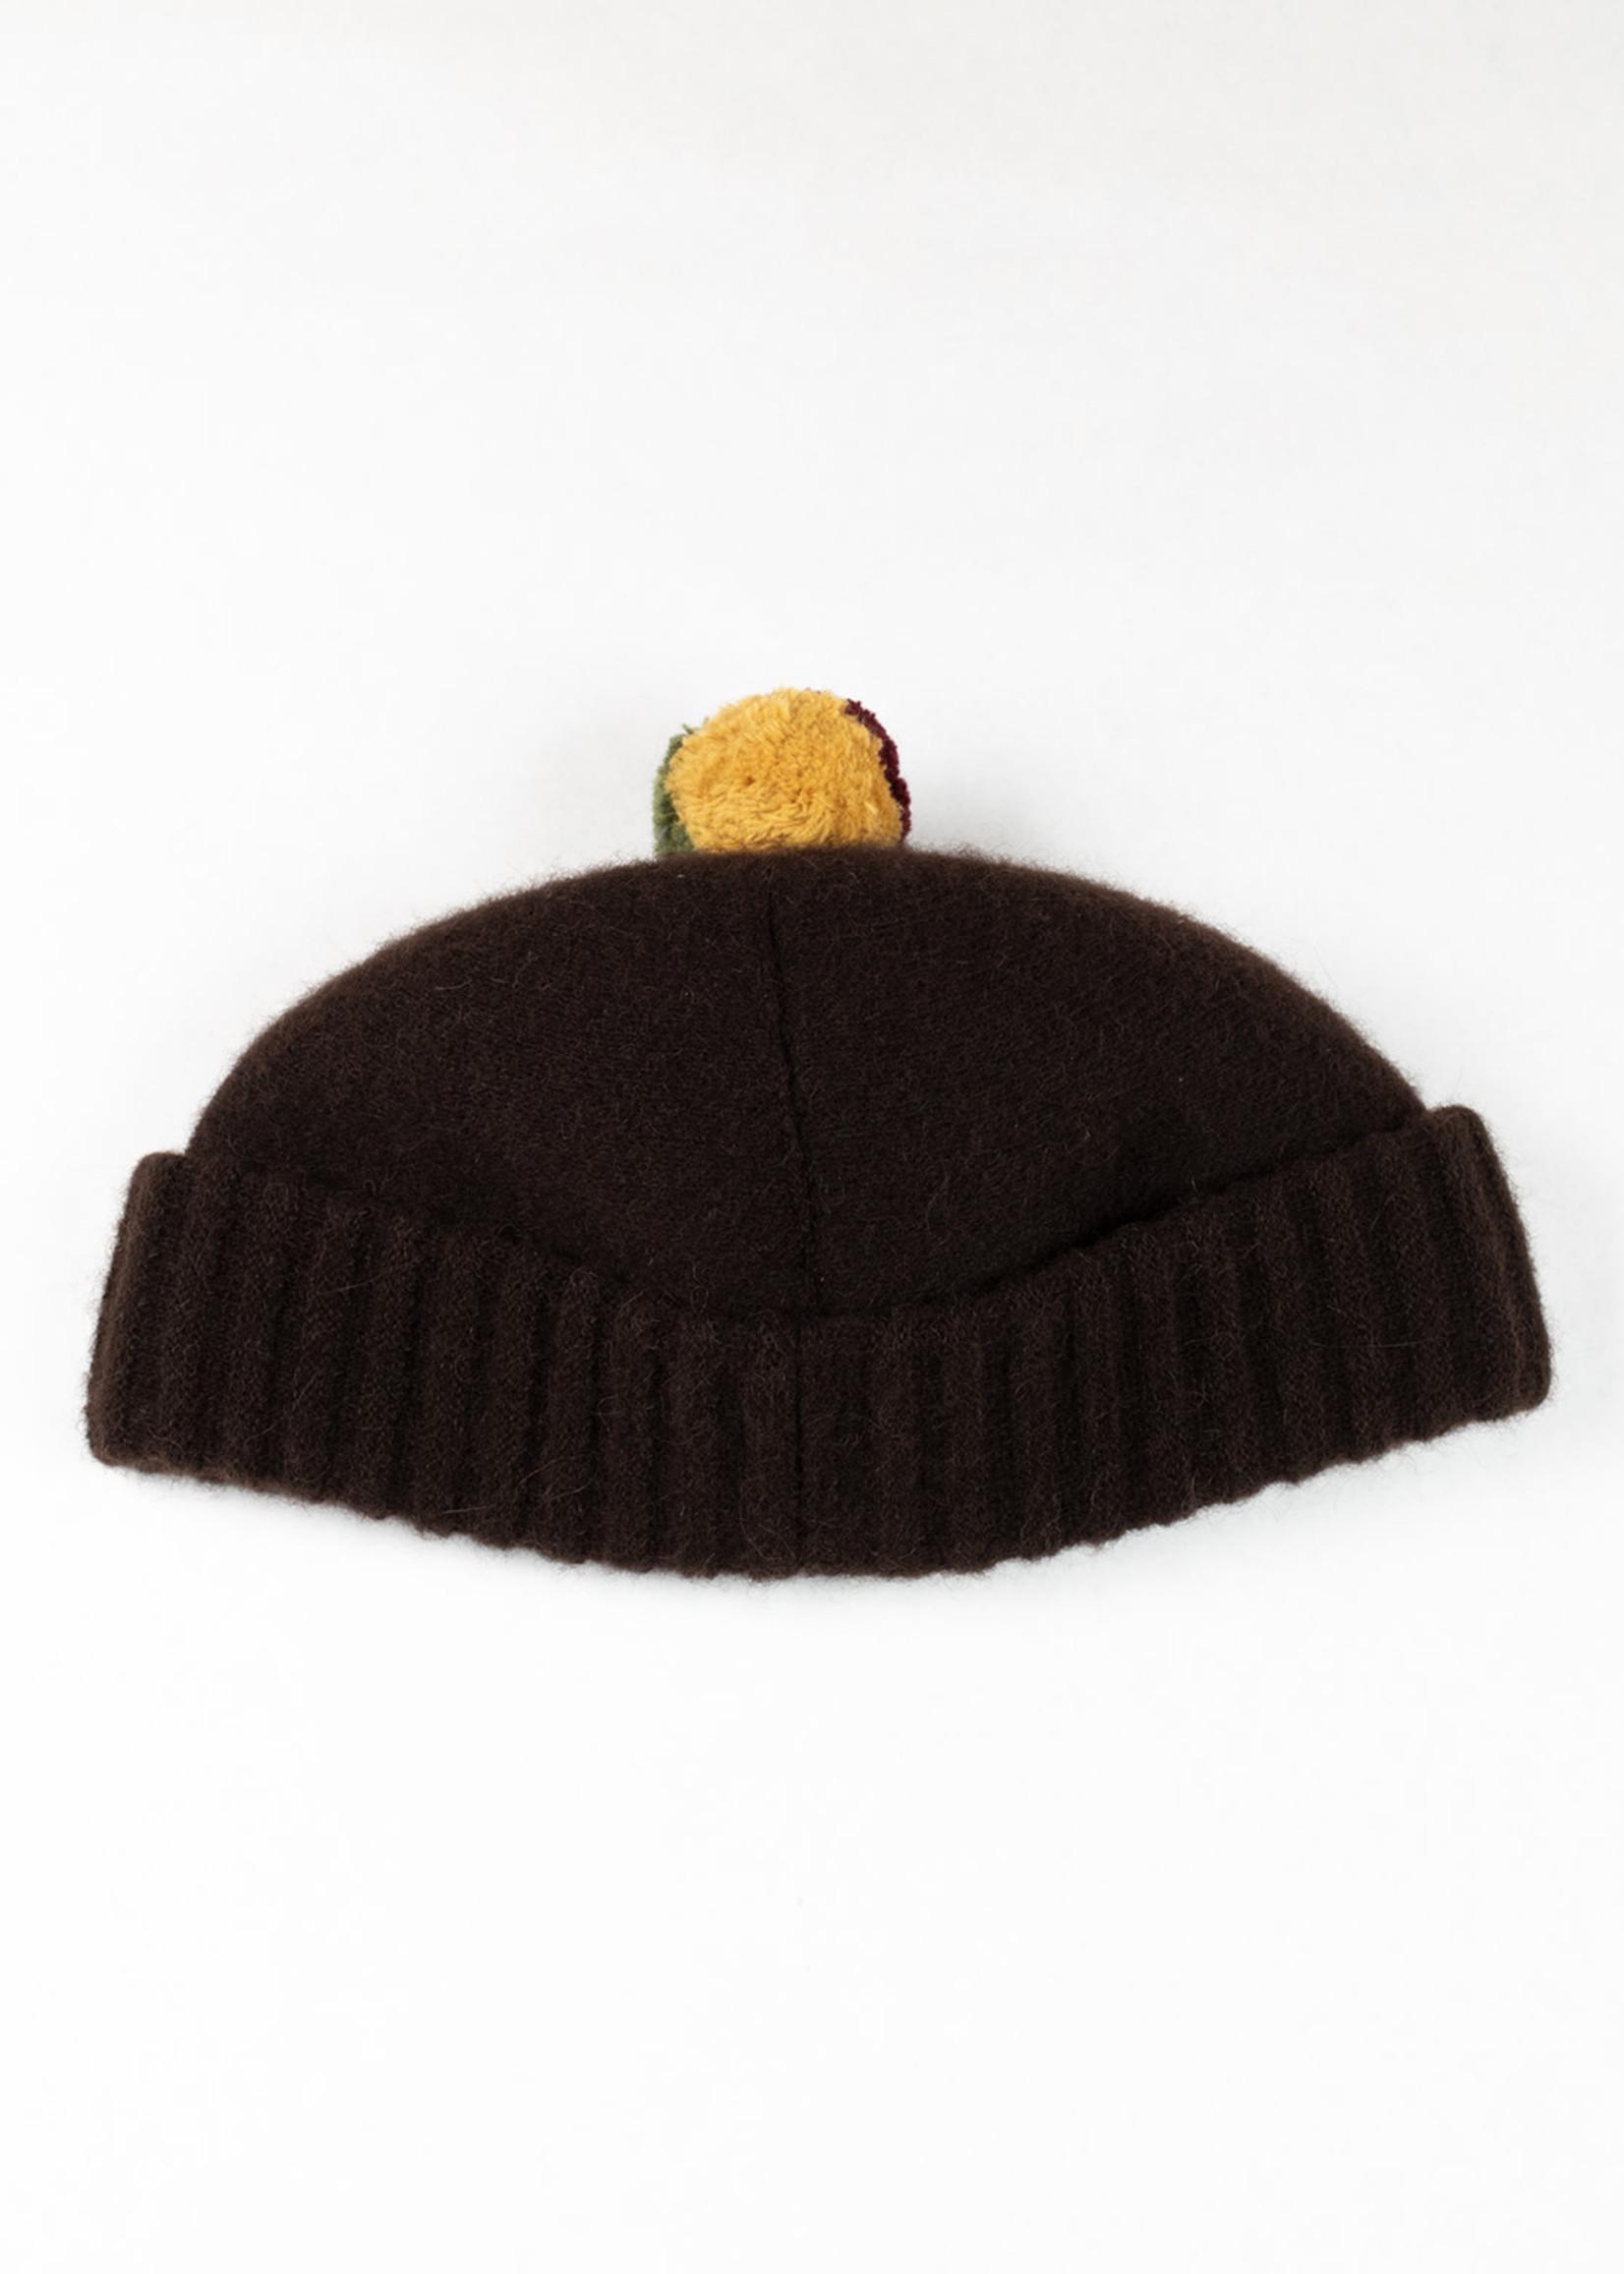 Cableami Kokeshi Alpaca/Wool Knit Bobble Cap Brown/Rasta b